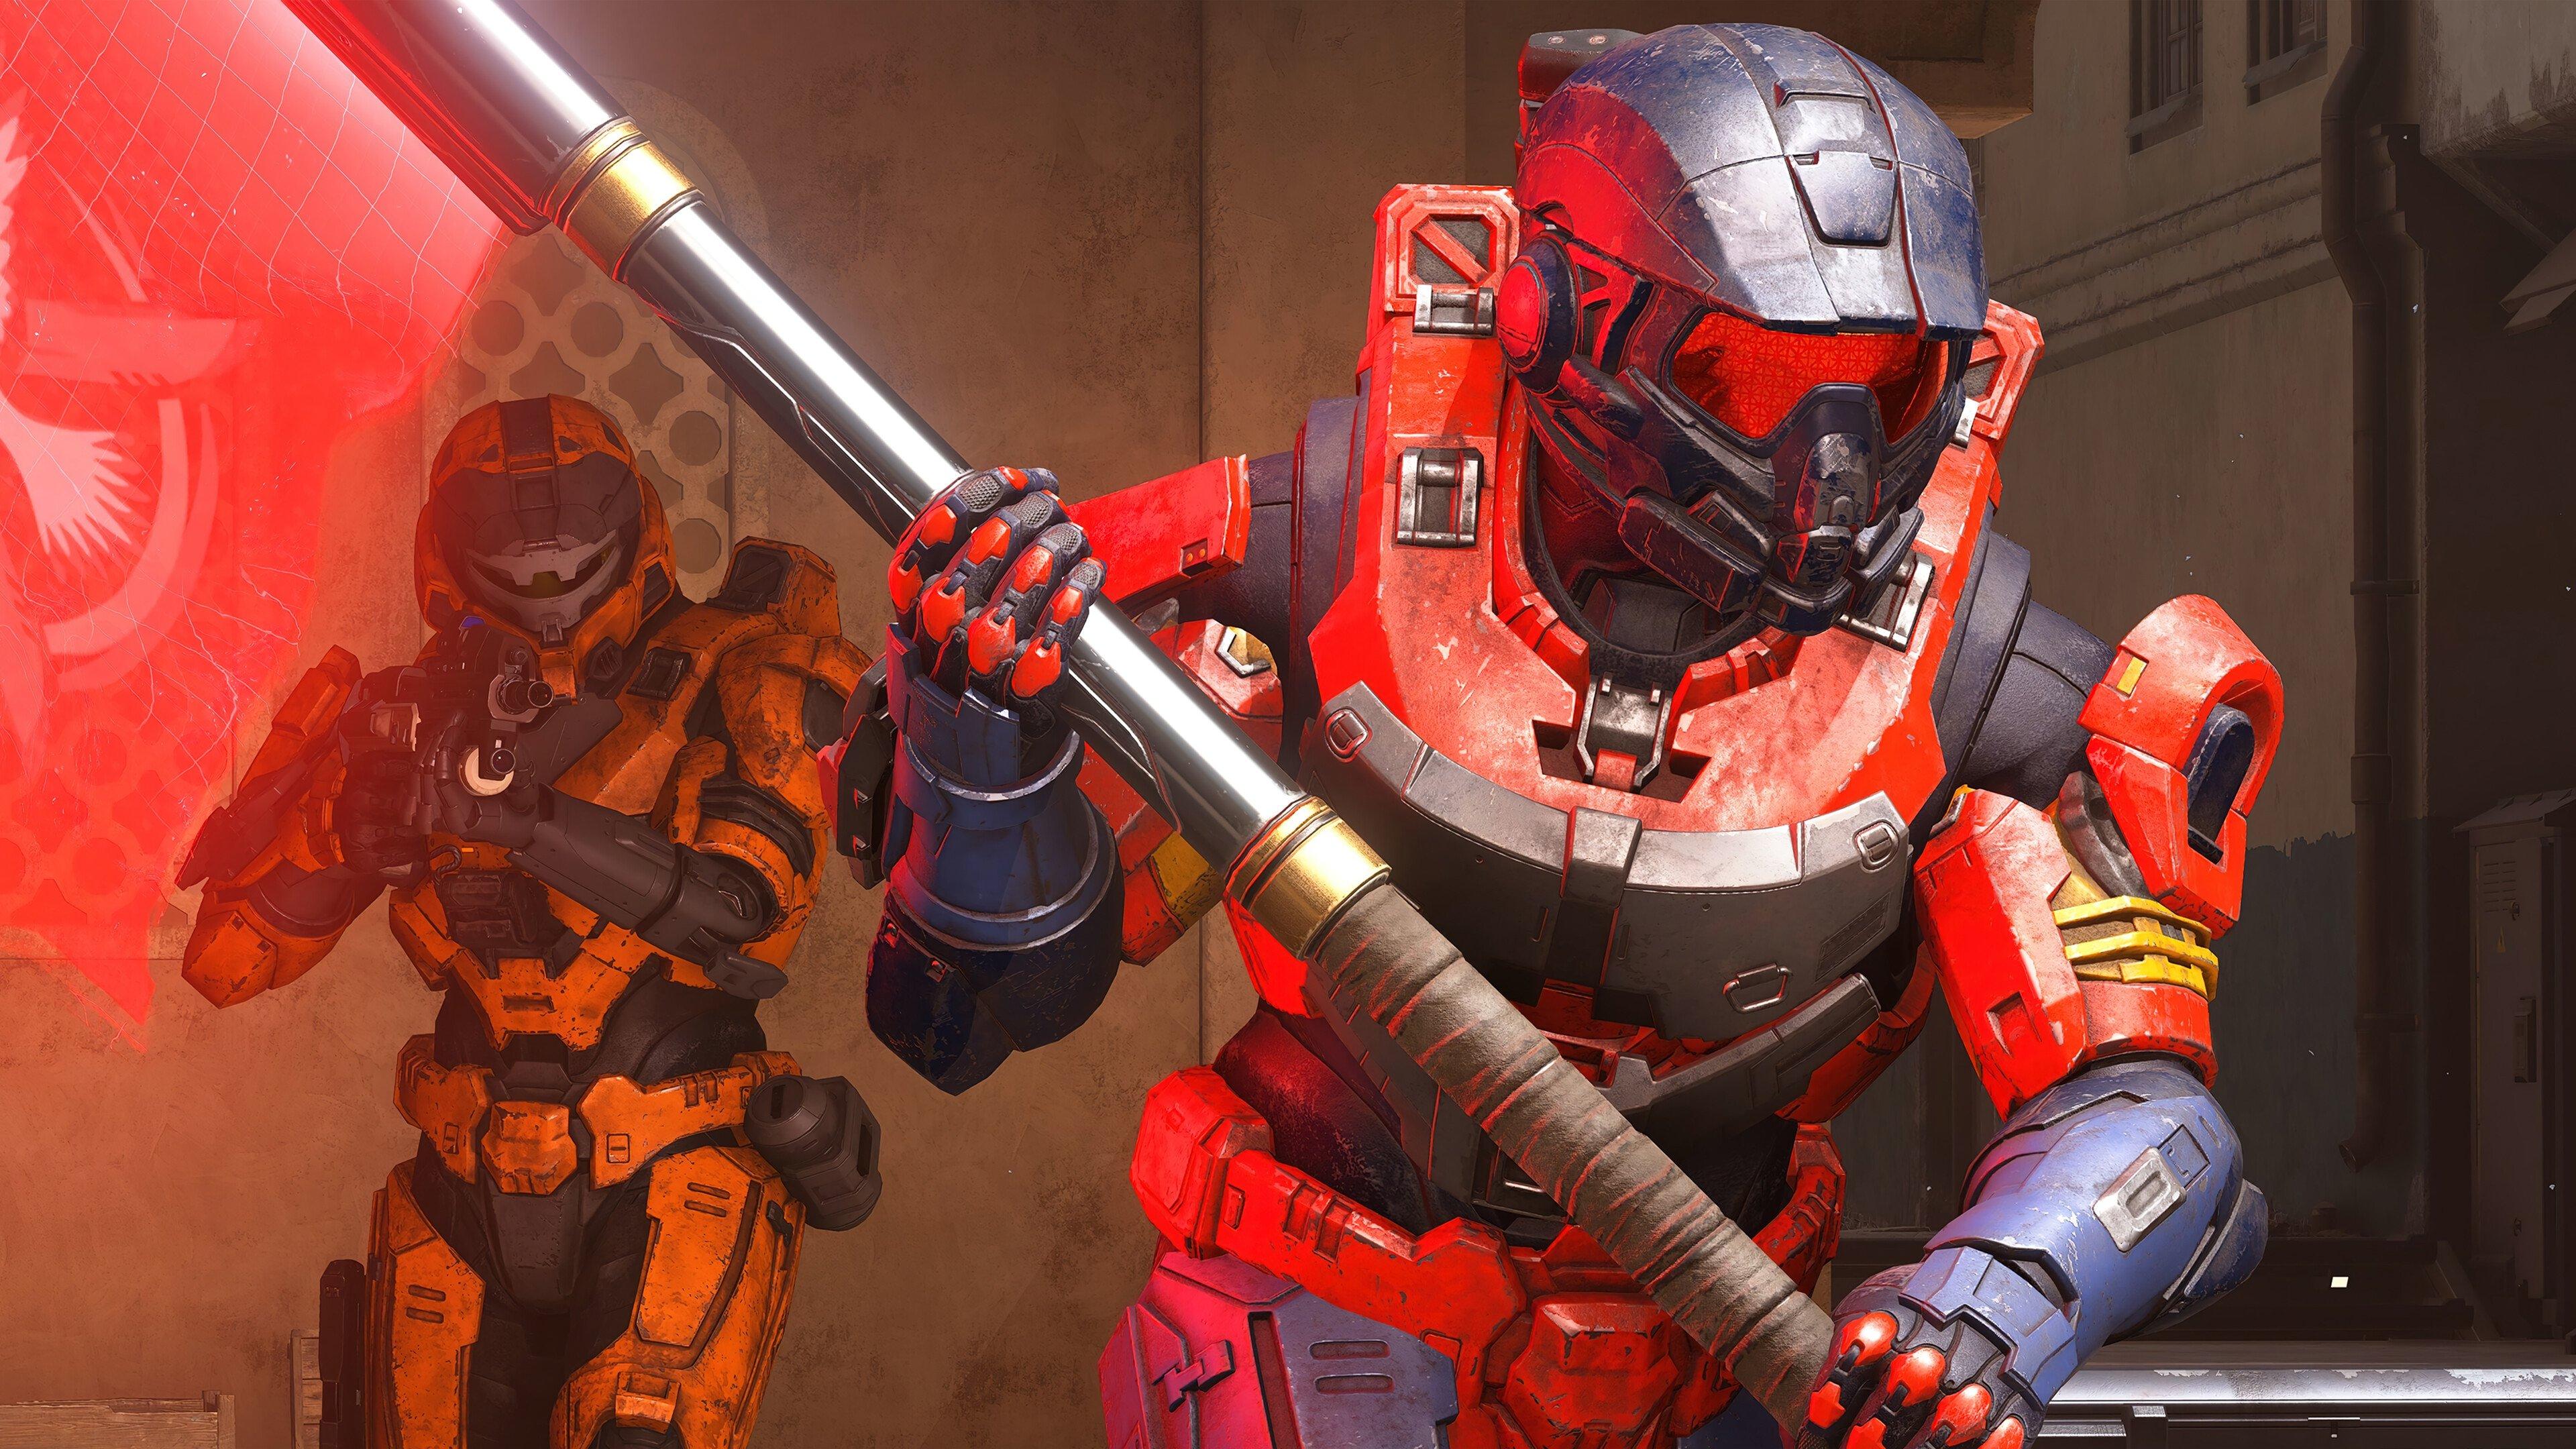 Wallpaper Halo Infinite Multiplayer